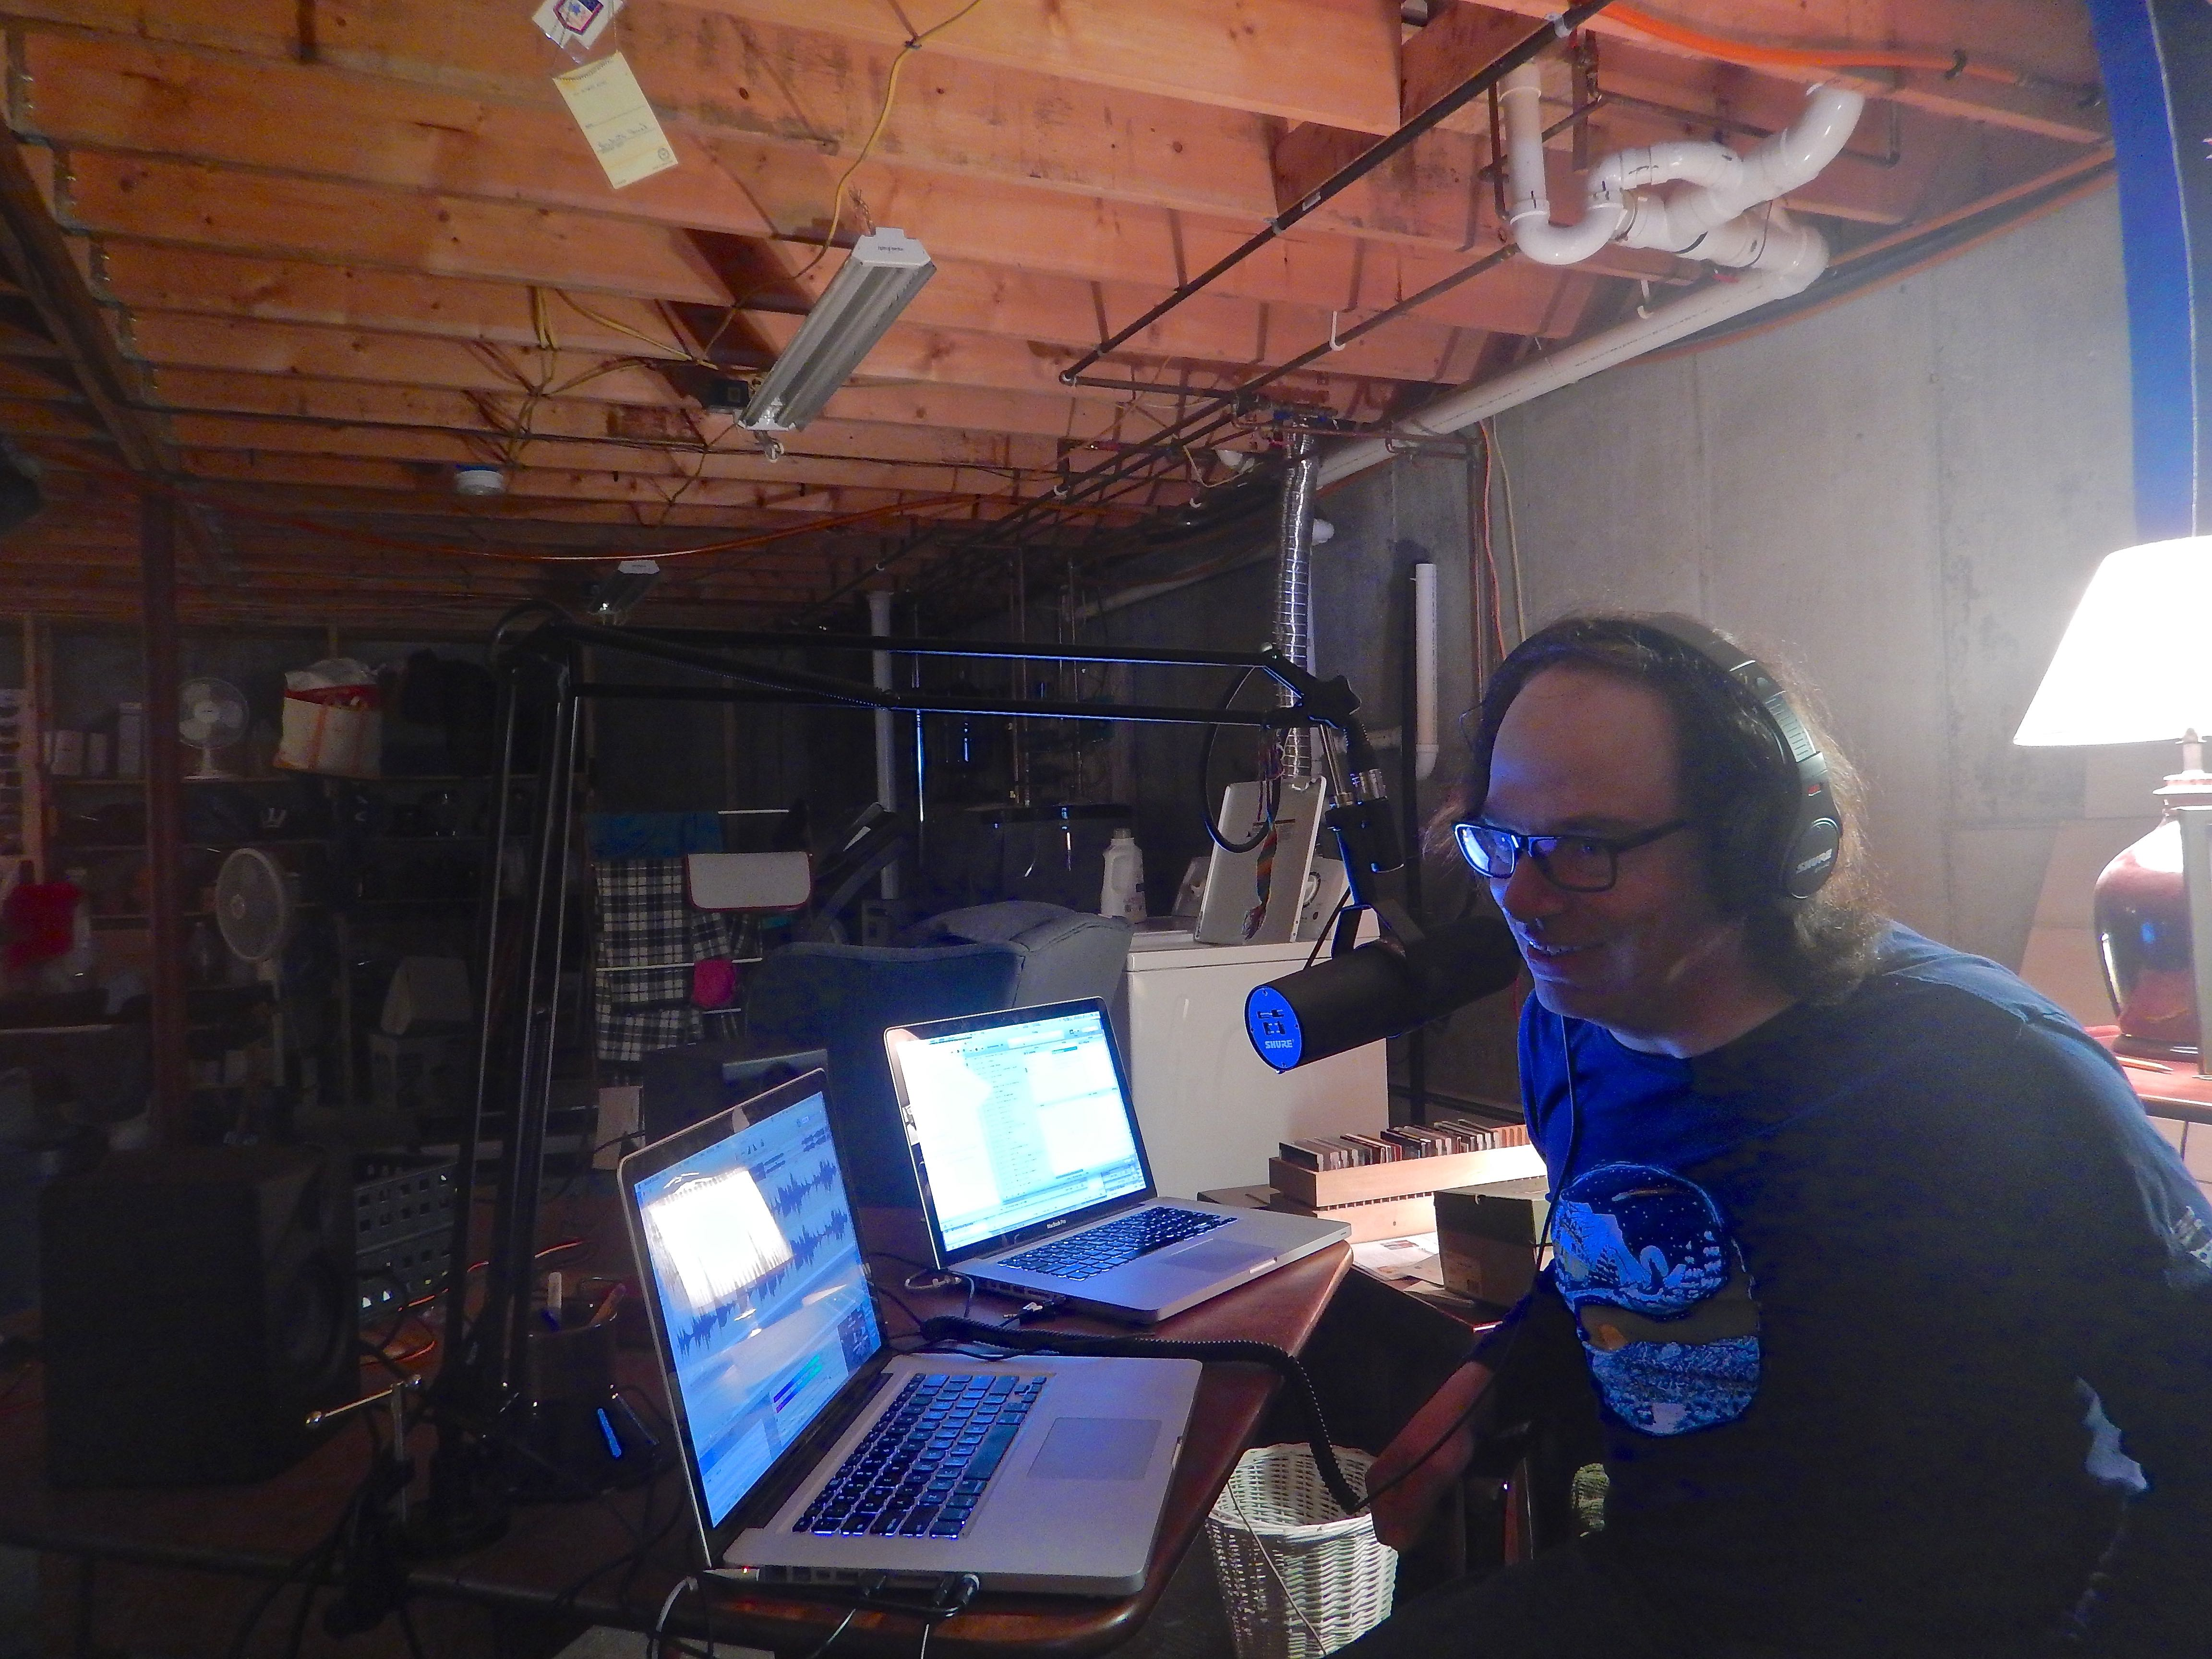 Caption: Home Recording Studio, Moretown, VT